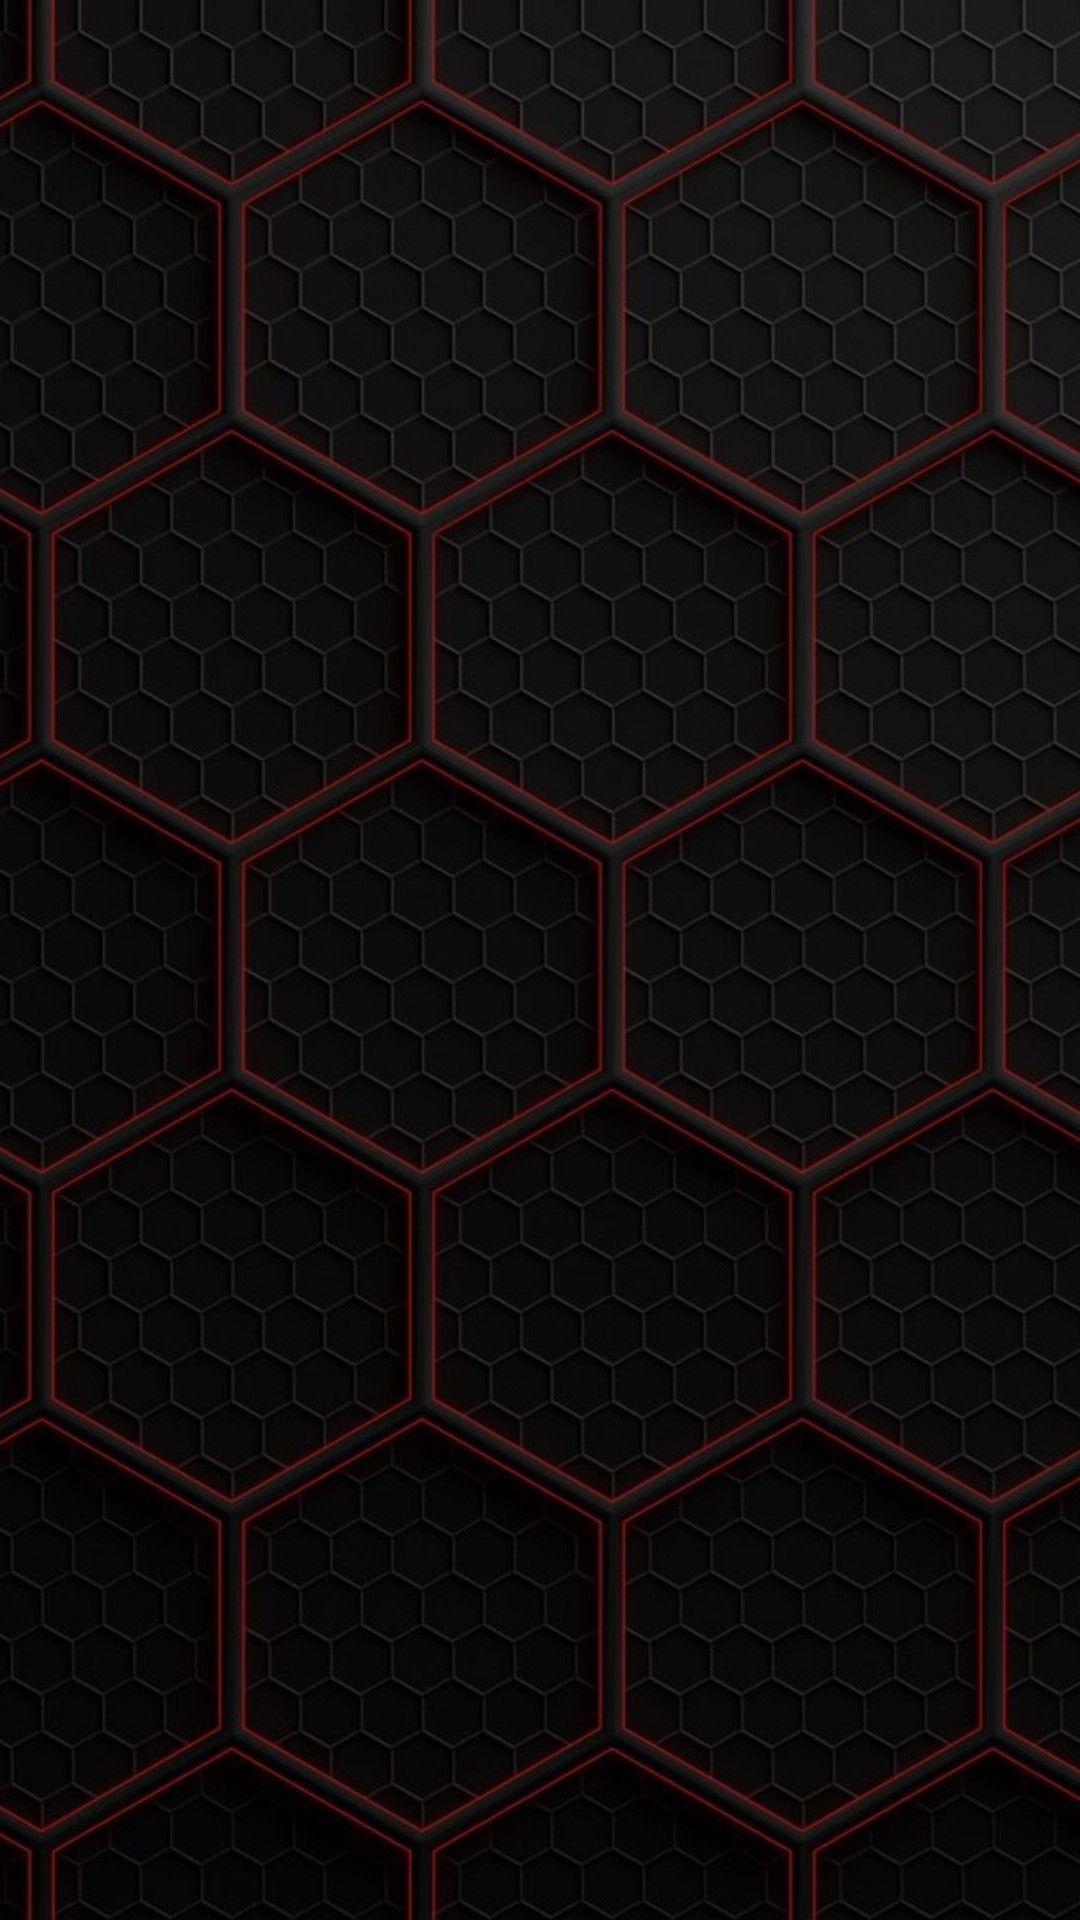 Black Red phone wallpaper